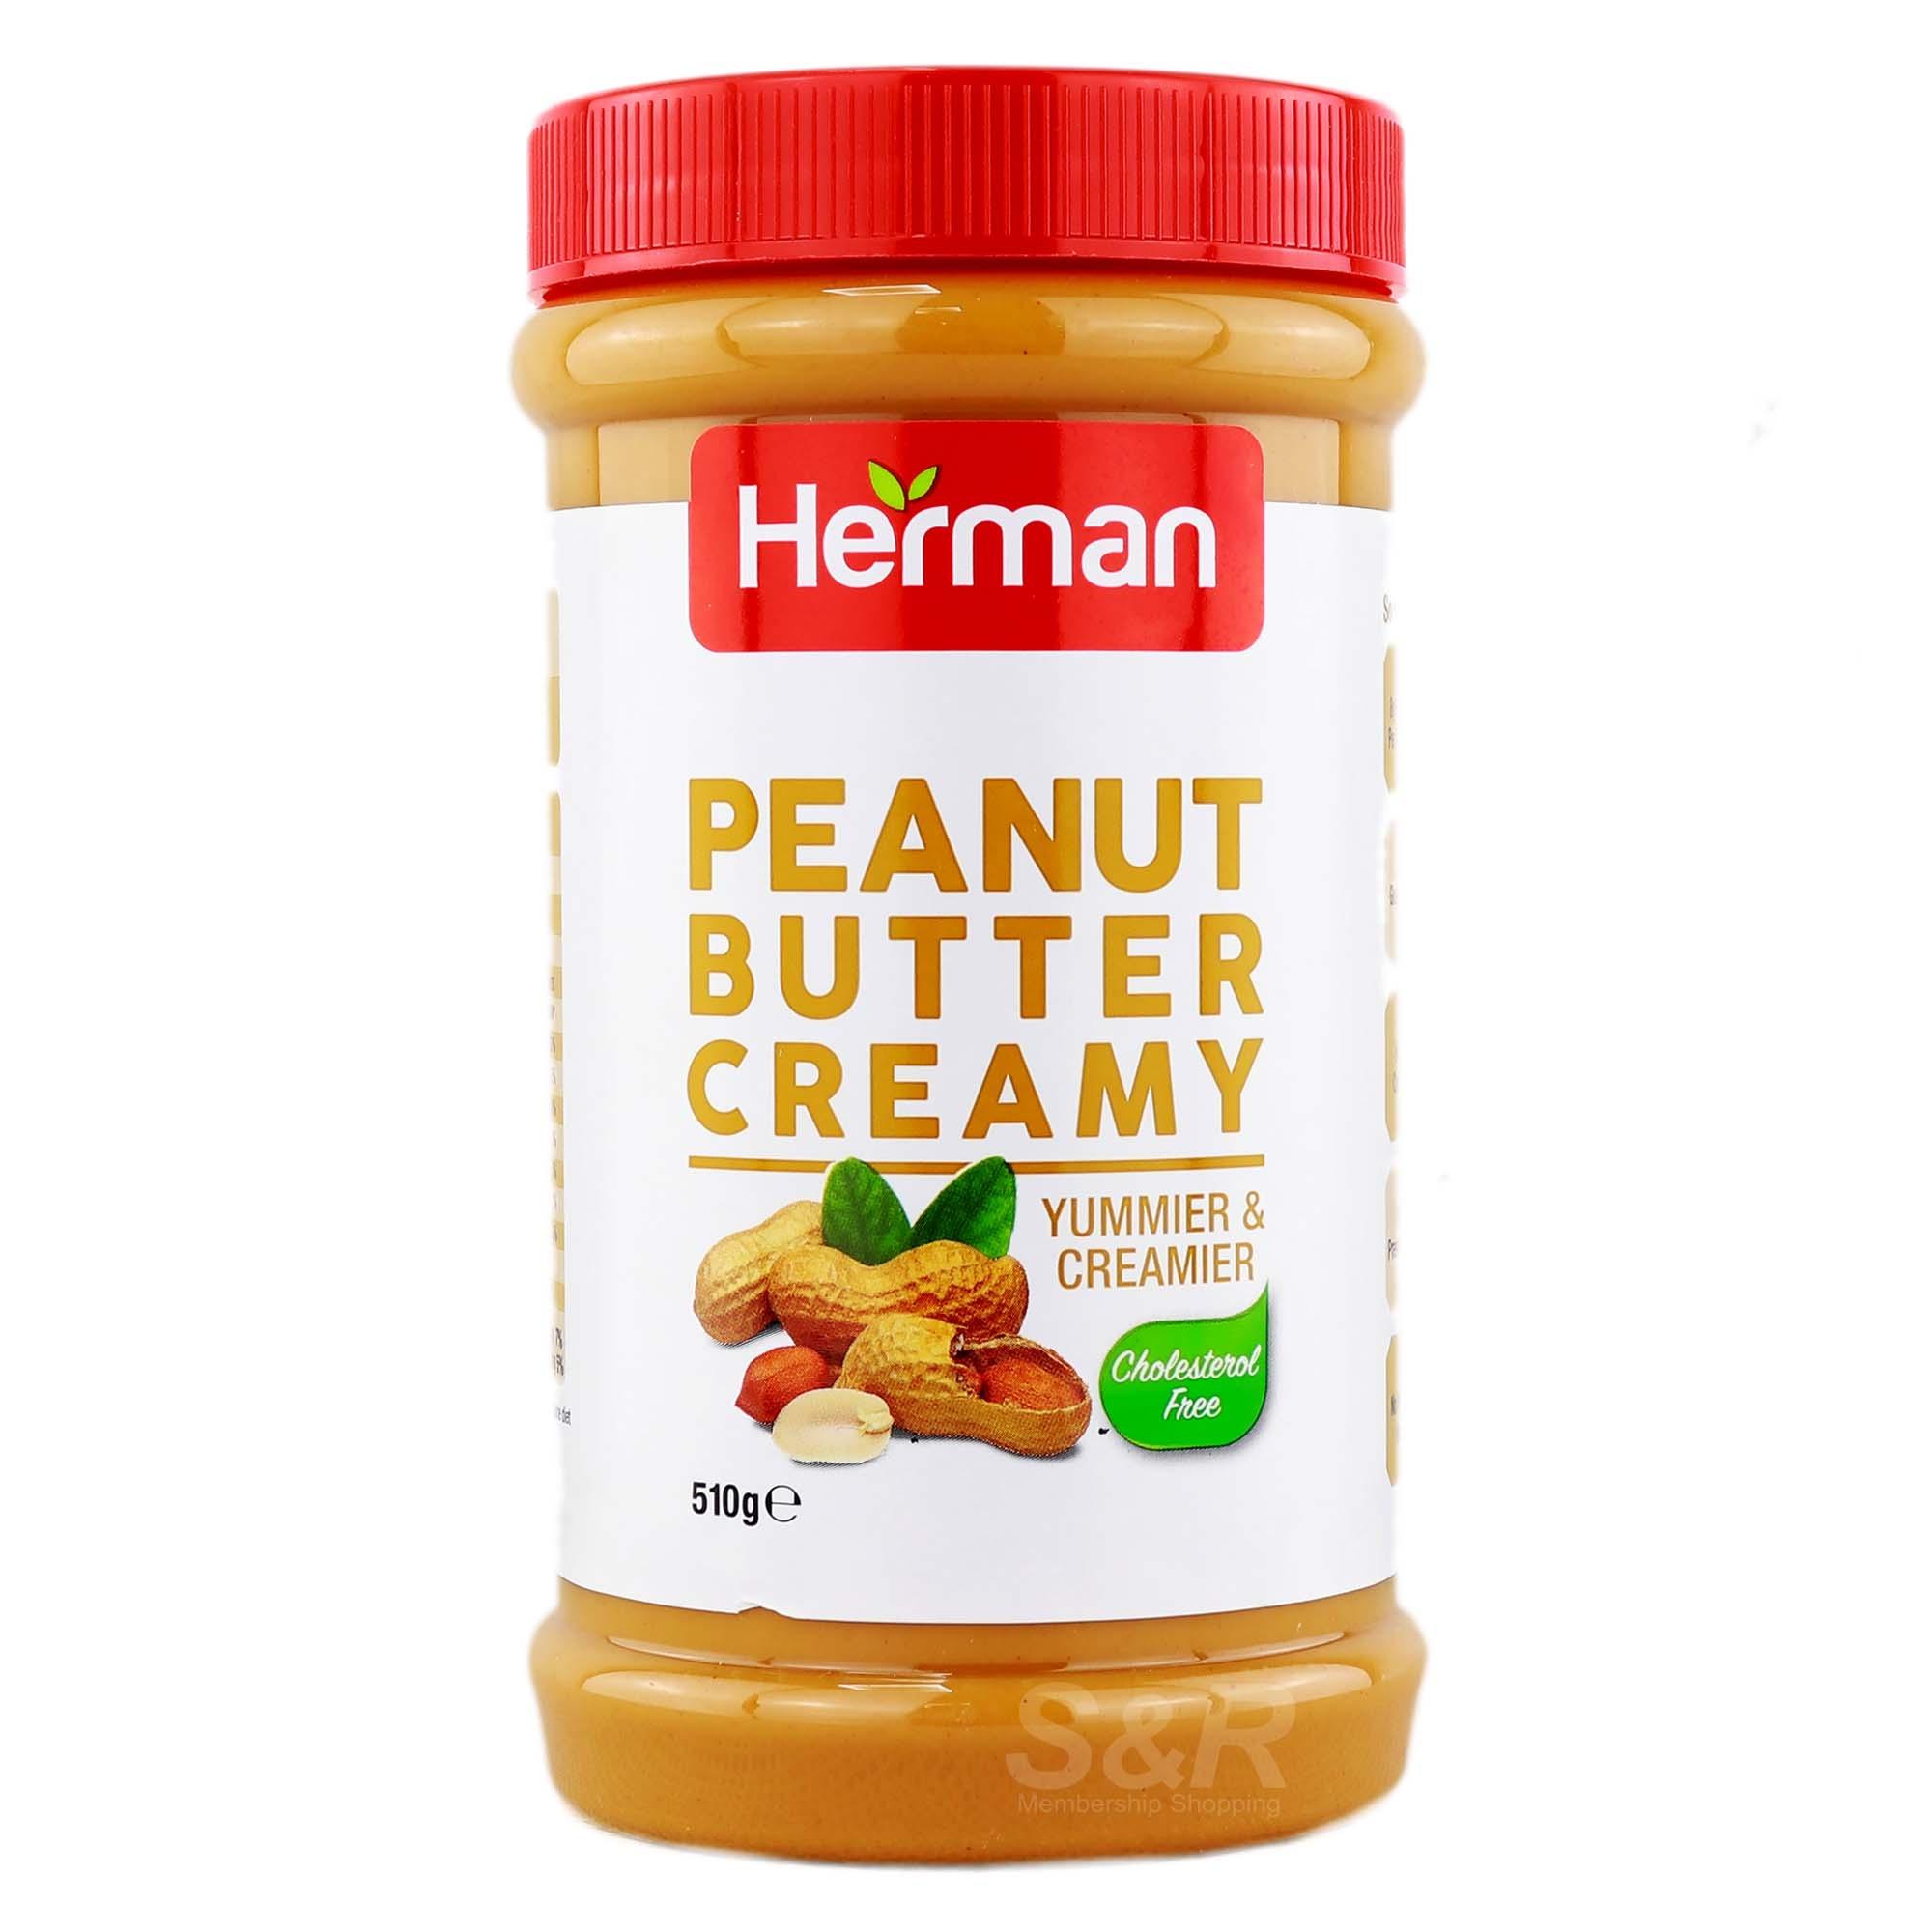 Herman Peanut Butter Creamy 510G - in Sri Lanka